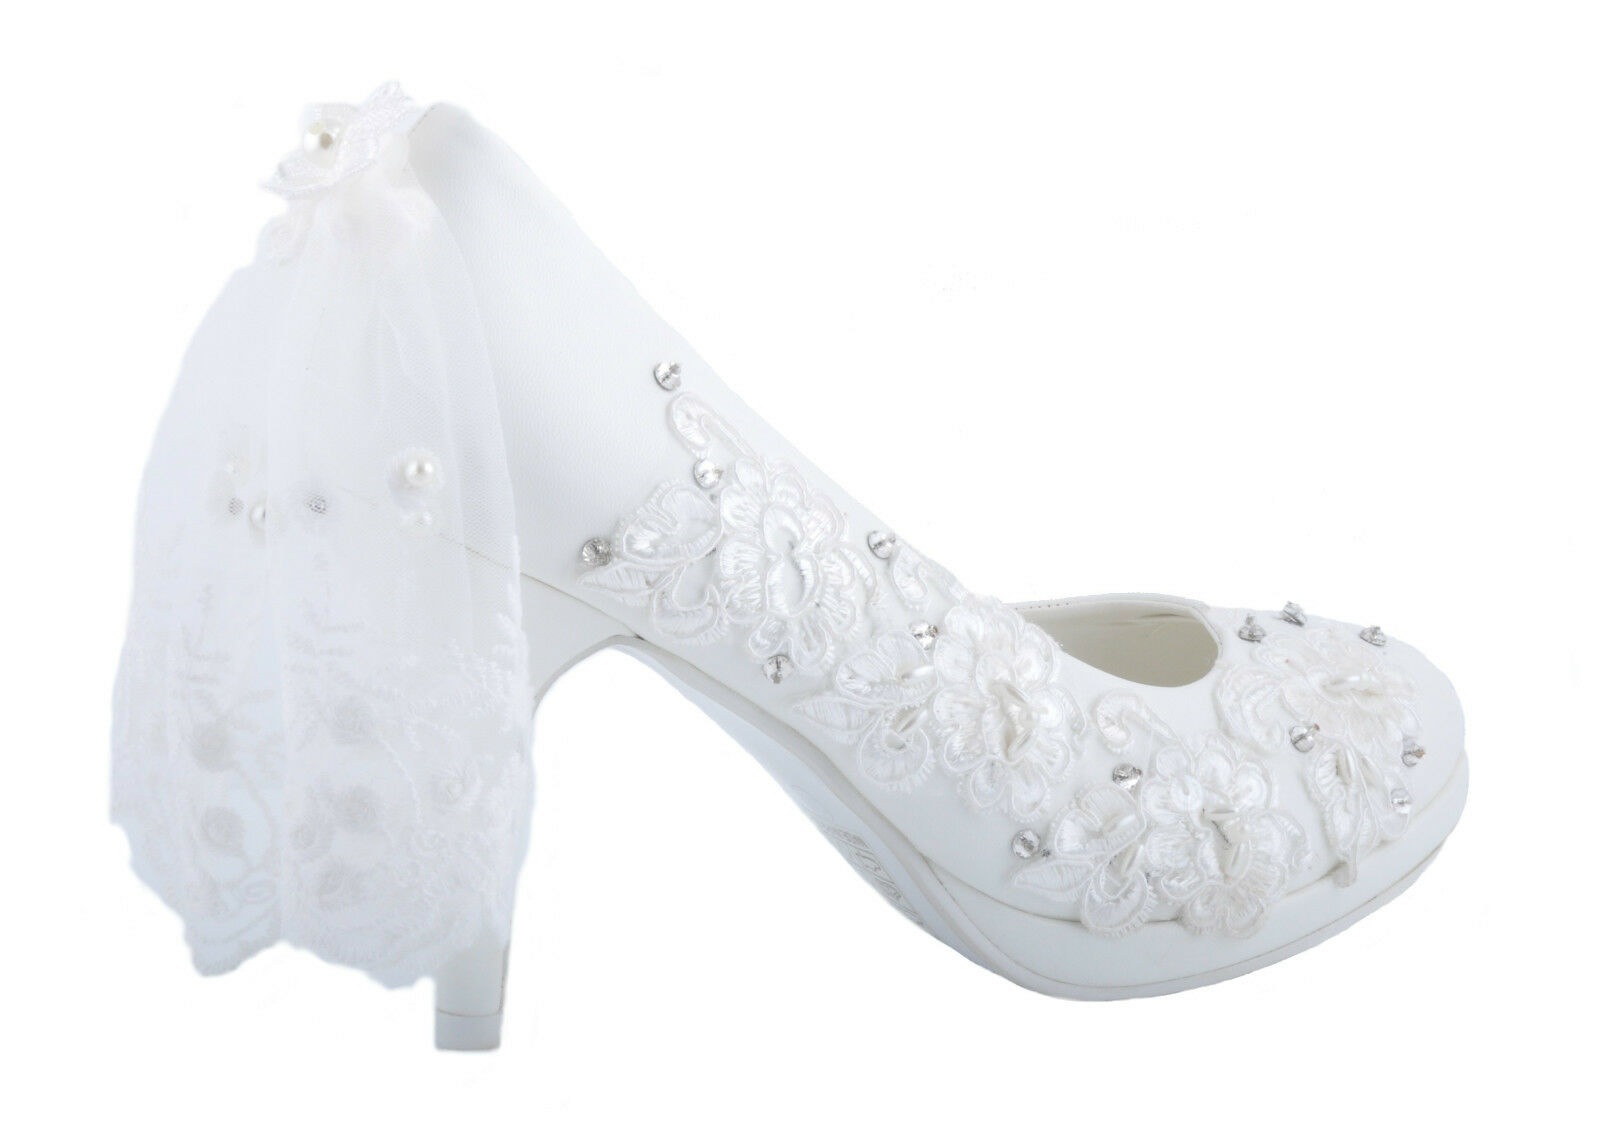 Off White Lace Veil Flower and Pearl Diamante Details Platform Wedding Heels